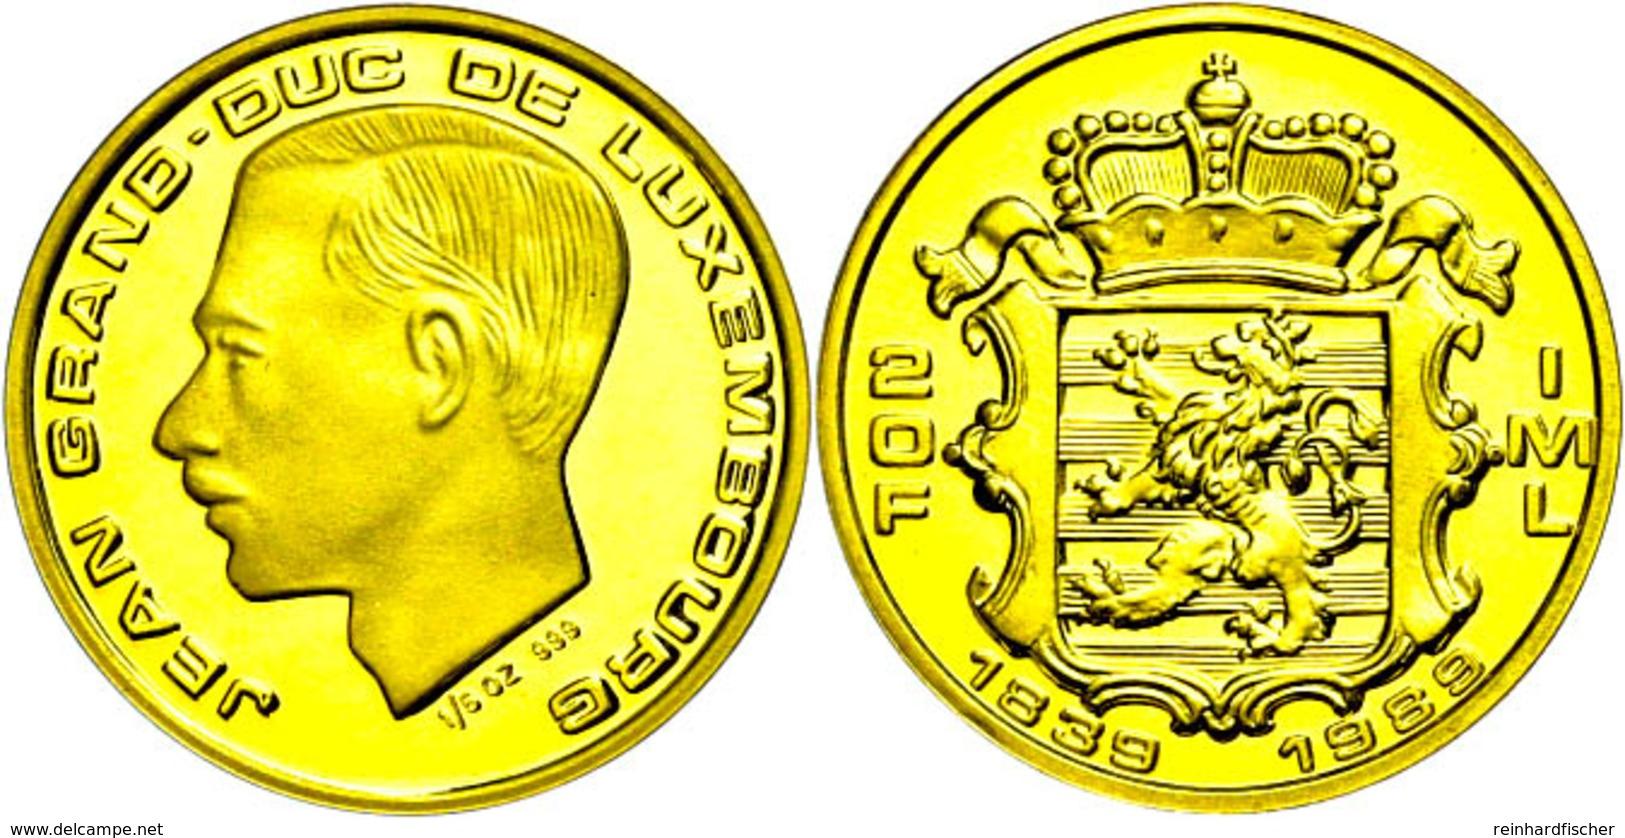 580 20 Francs, Gold, 1989, Jean, 150. Jahre Unabhängigkeit, Fb. 12, PP  PP - Luxembourg